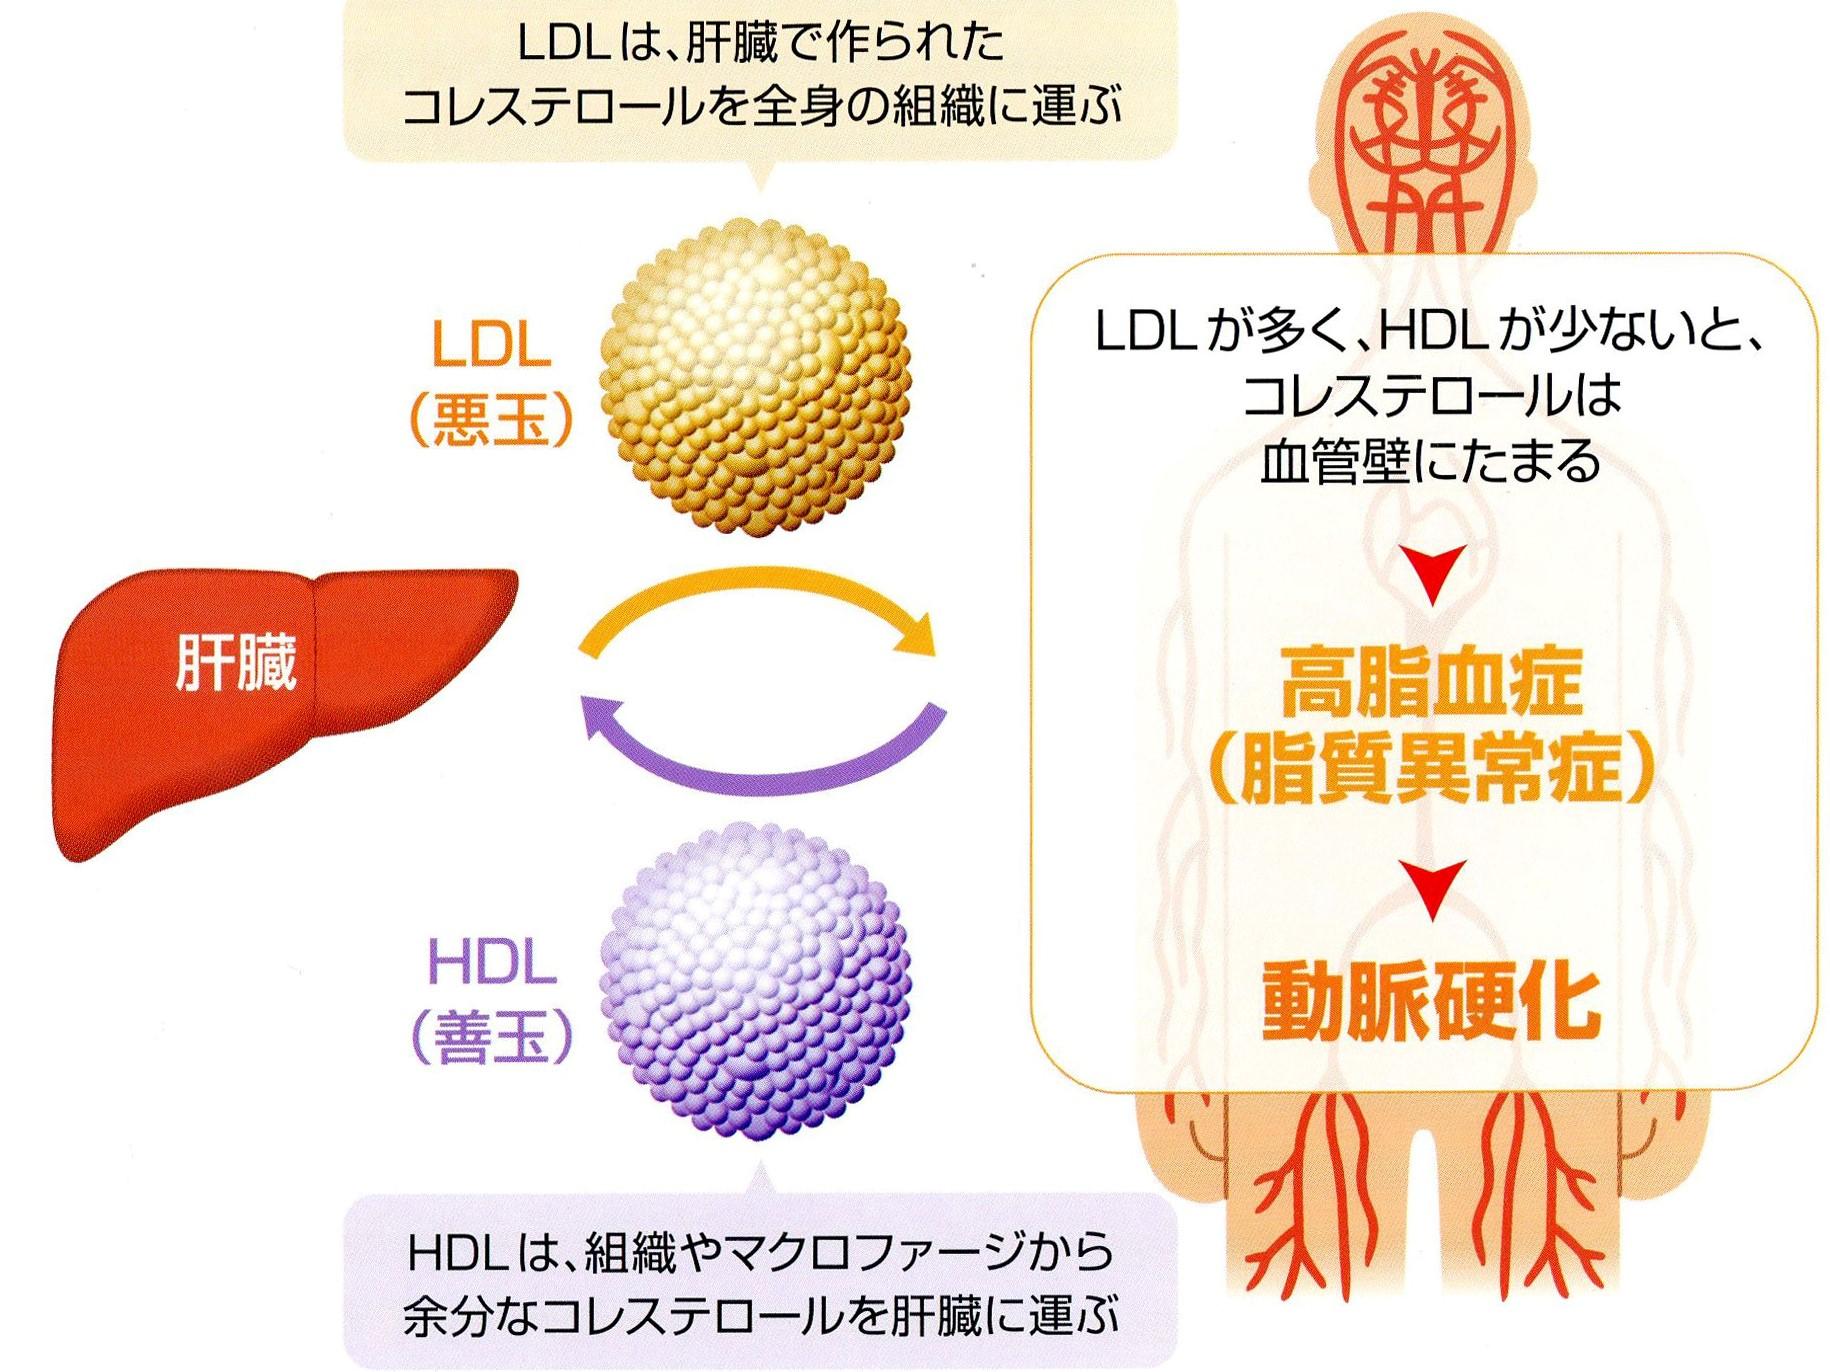 HDLとLDL